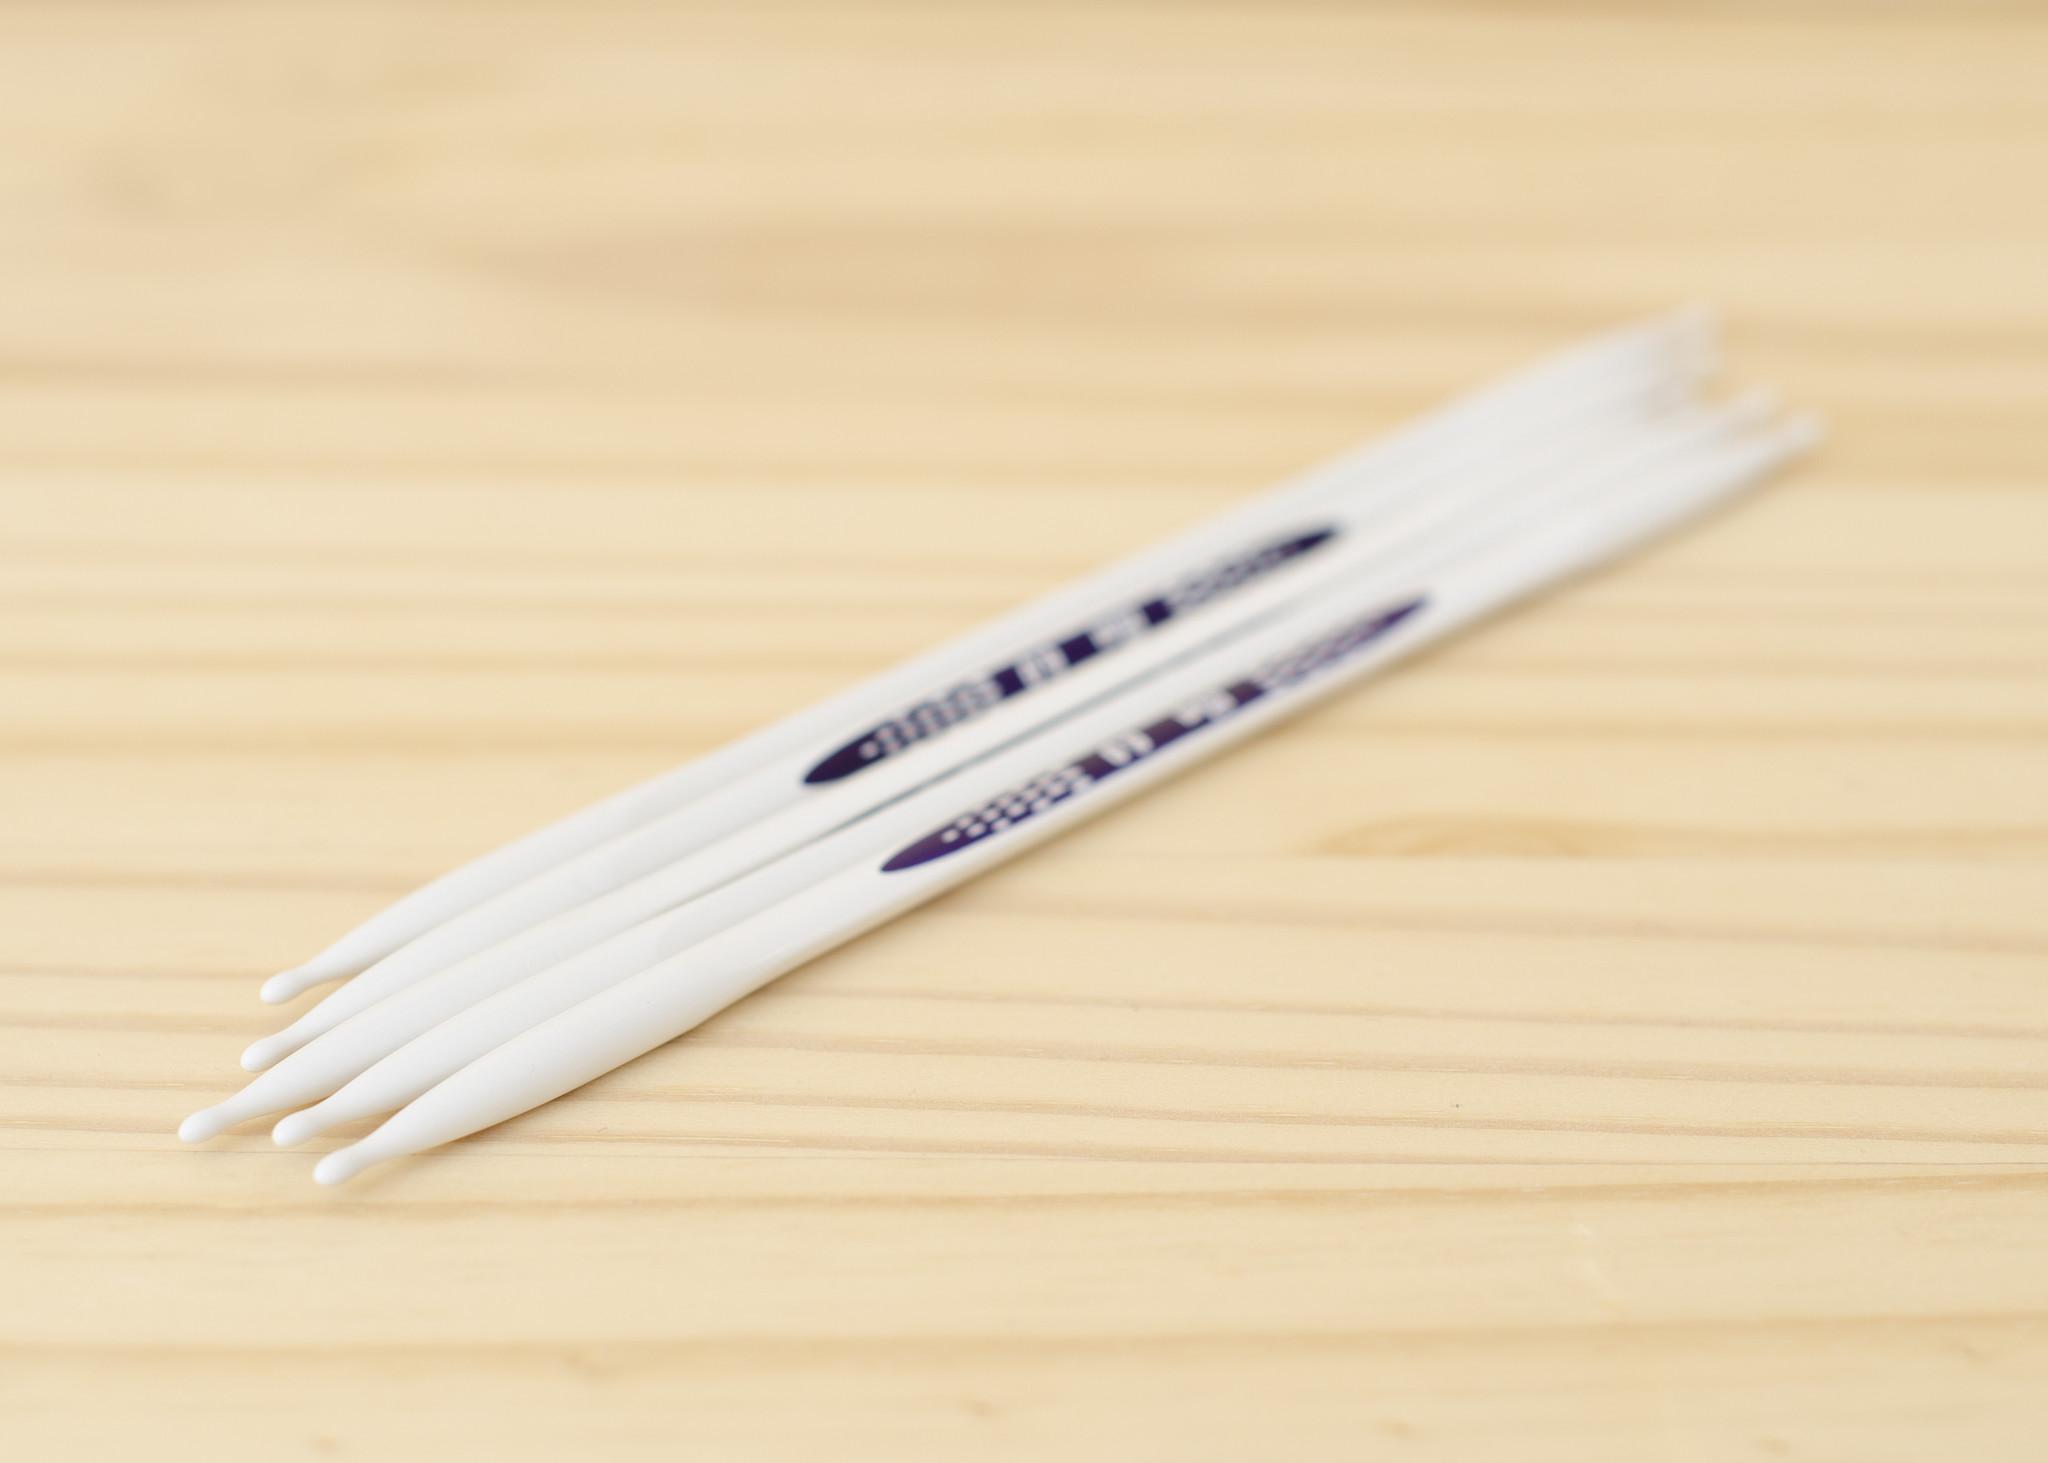 Prym : Ergonomic Double Pointed Needles : 6mm